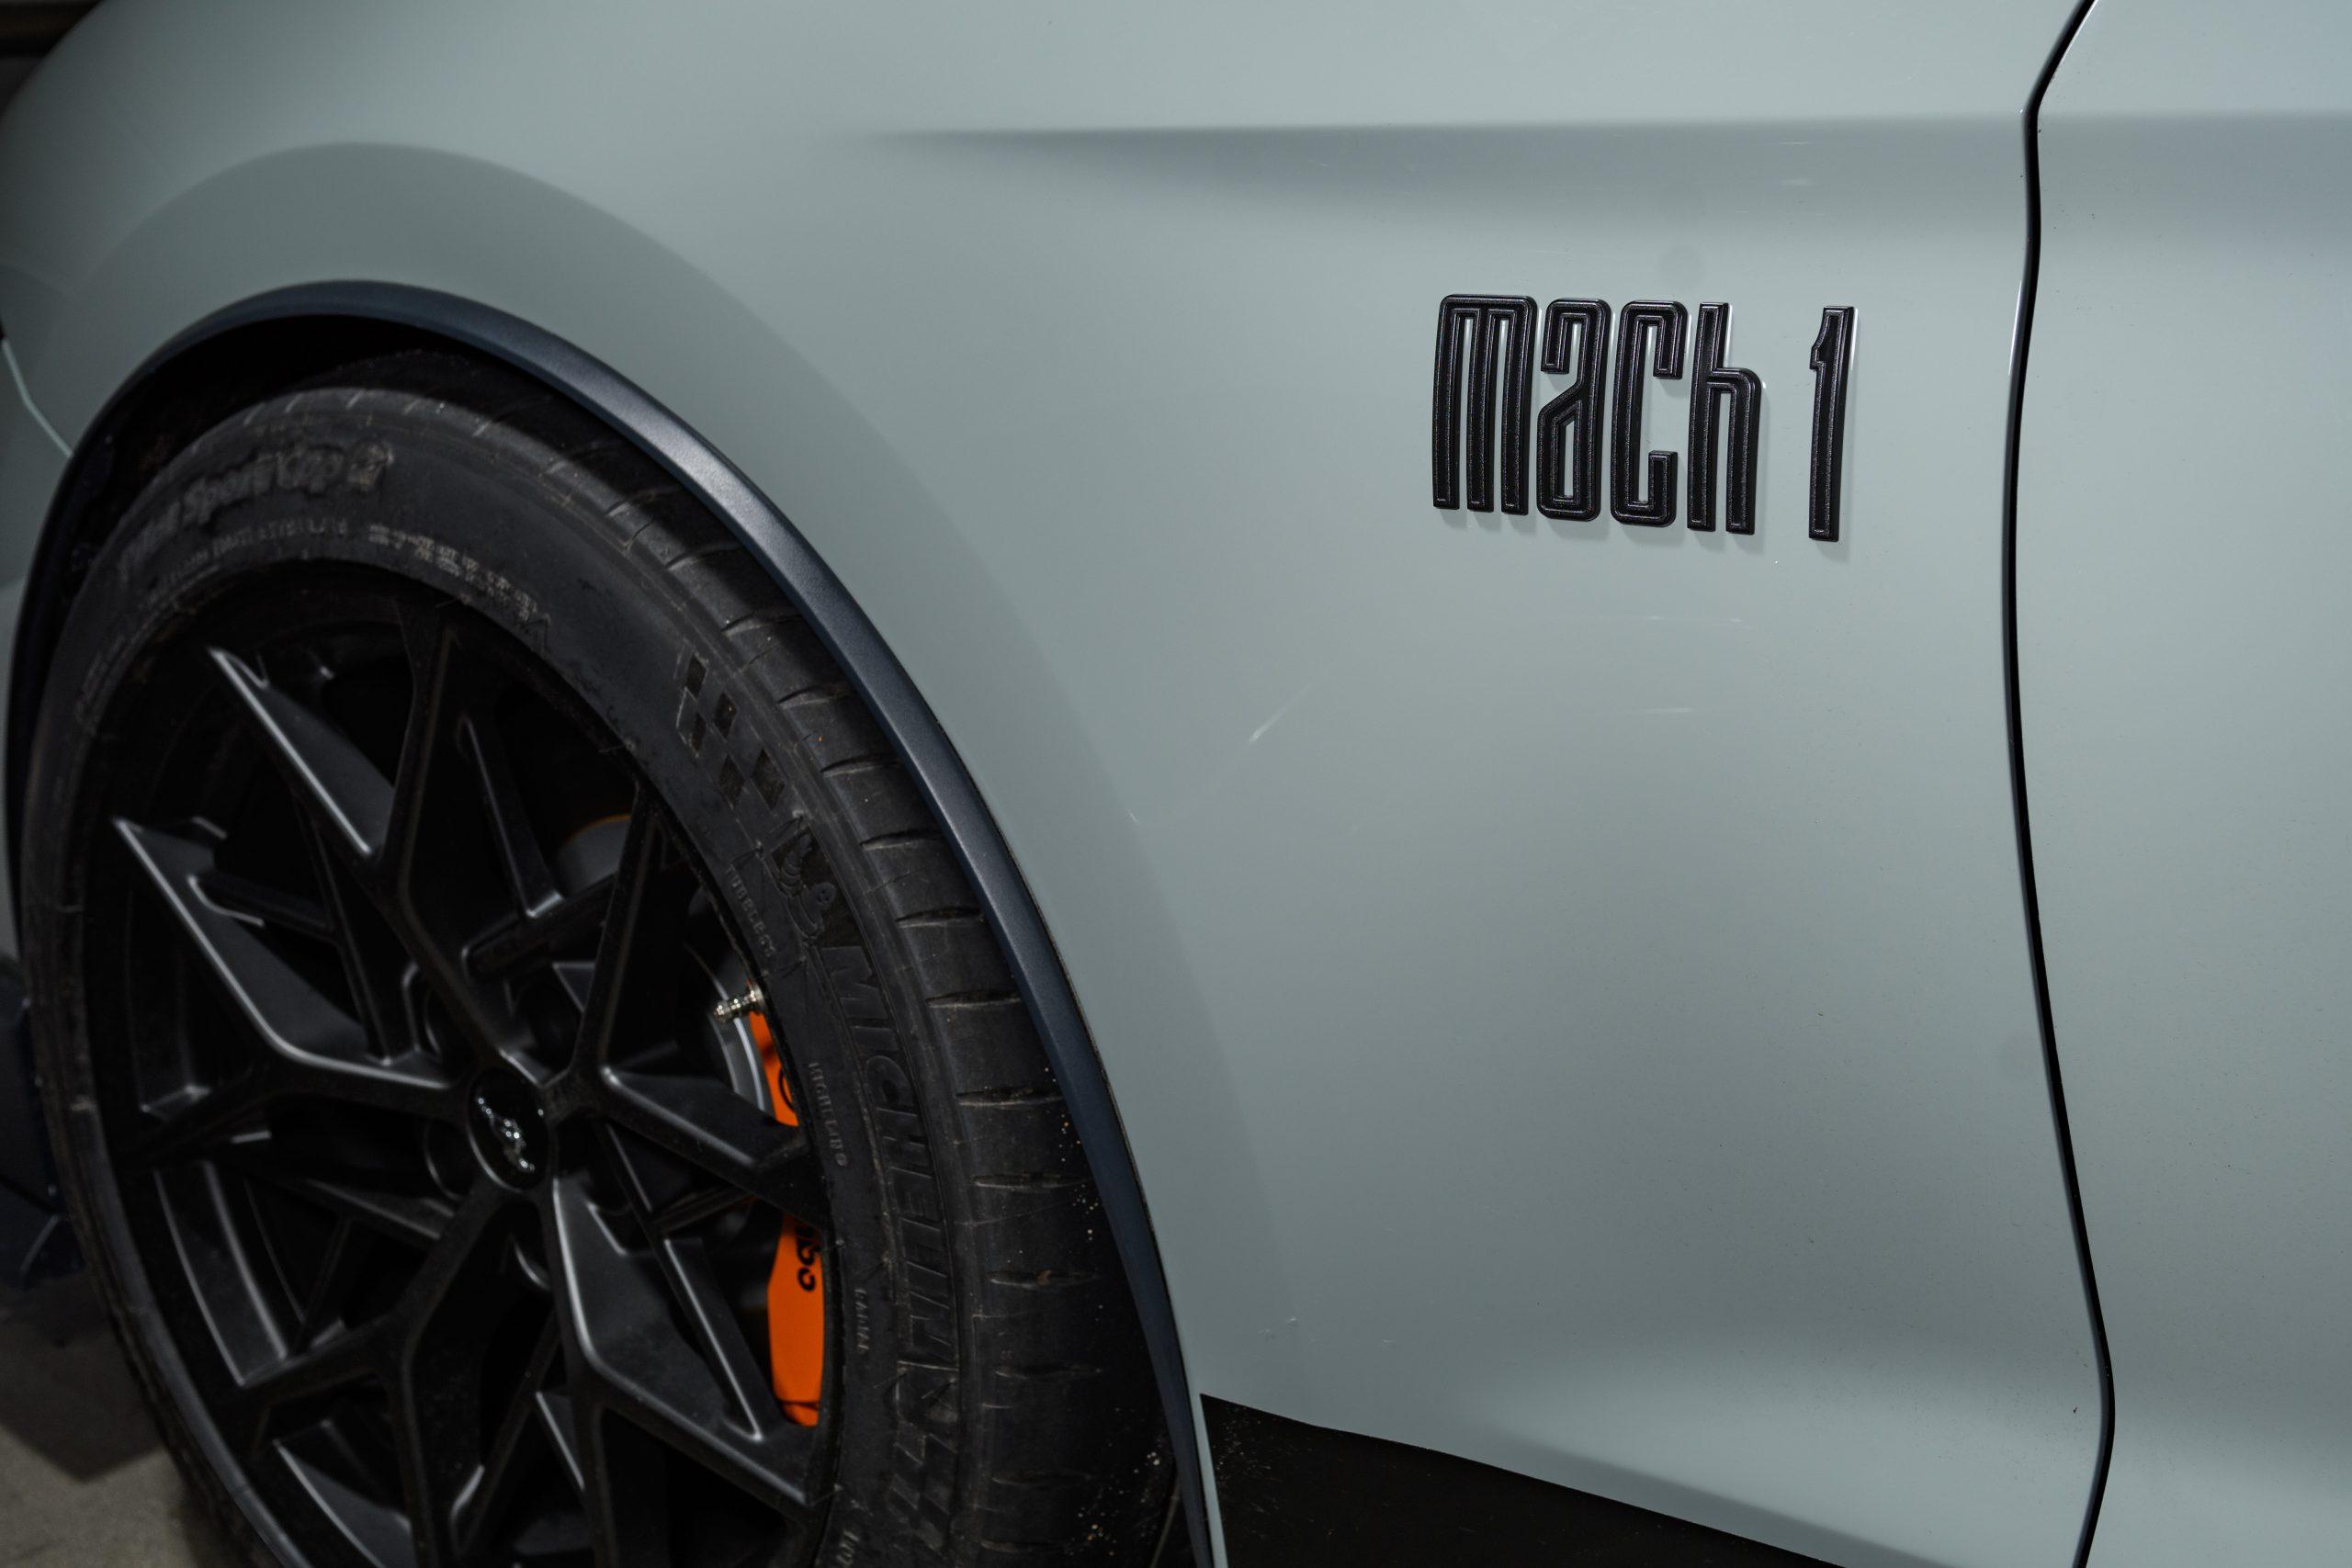 2021 Ford Mustang Mach 1 logo fender